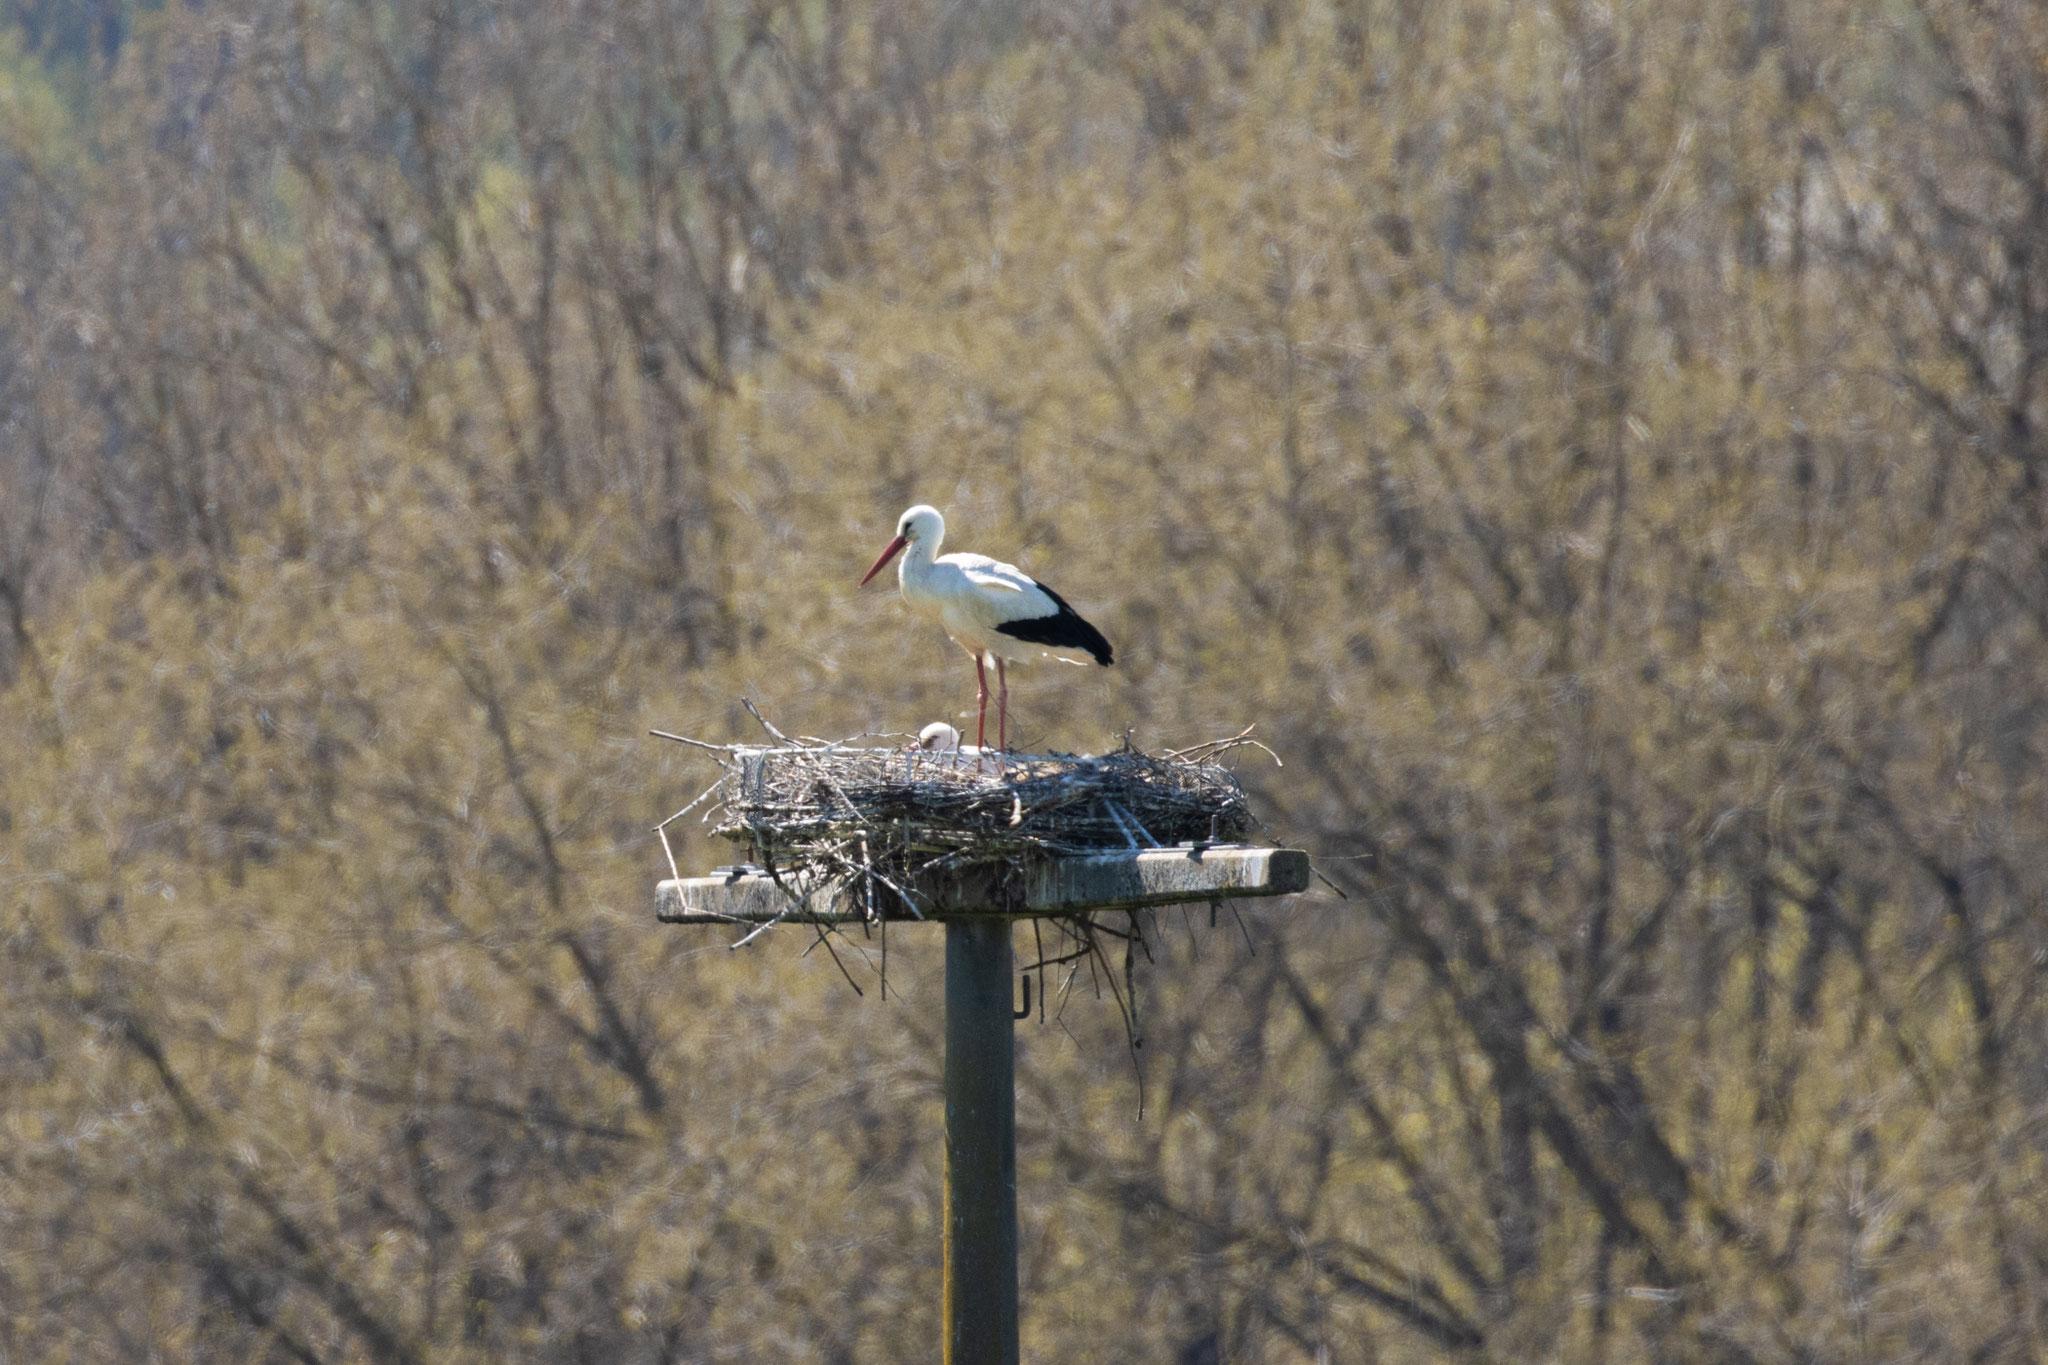 Storchenpaar im Nest am 26.04.2021 (Foto: B. Budig)